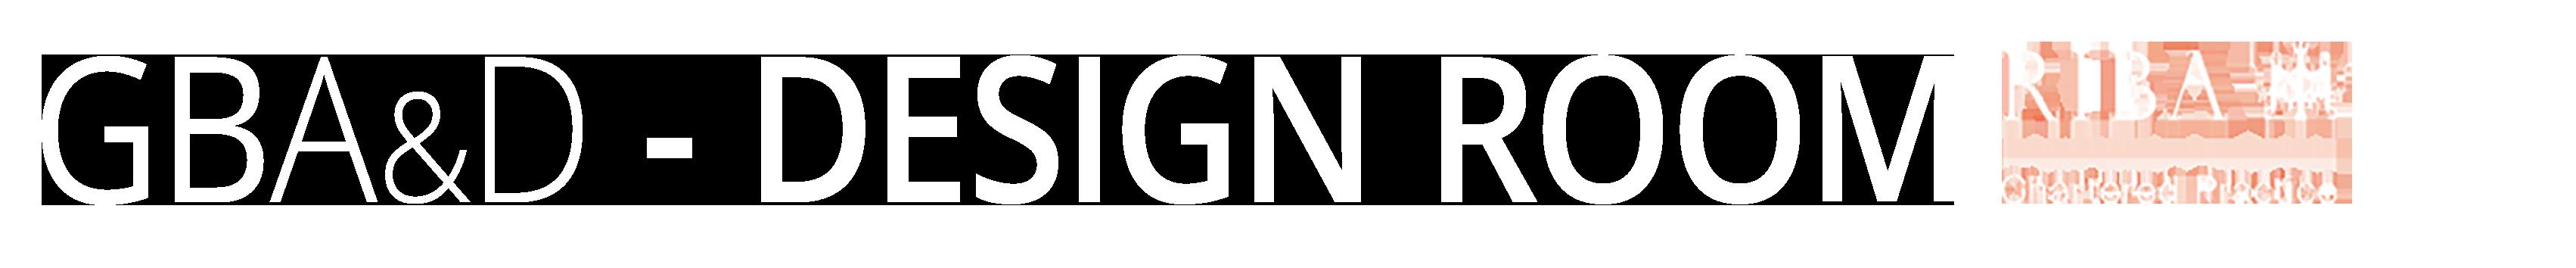 GBA&D DESIGN ROOM